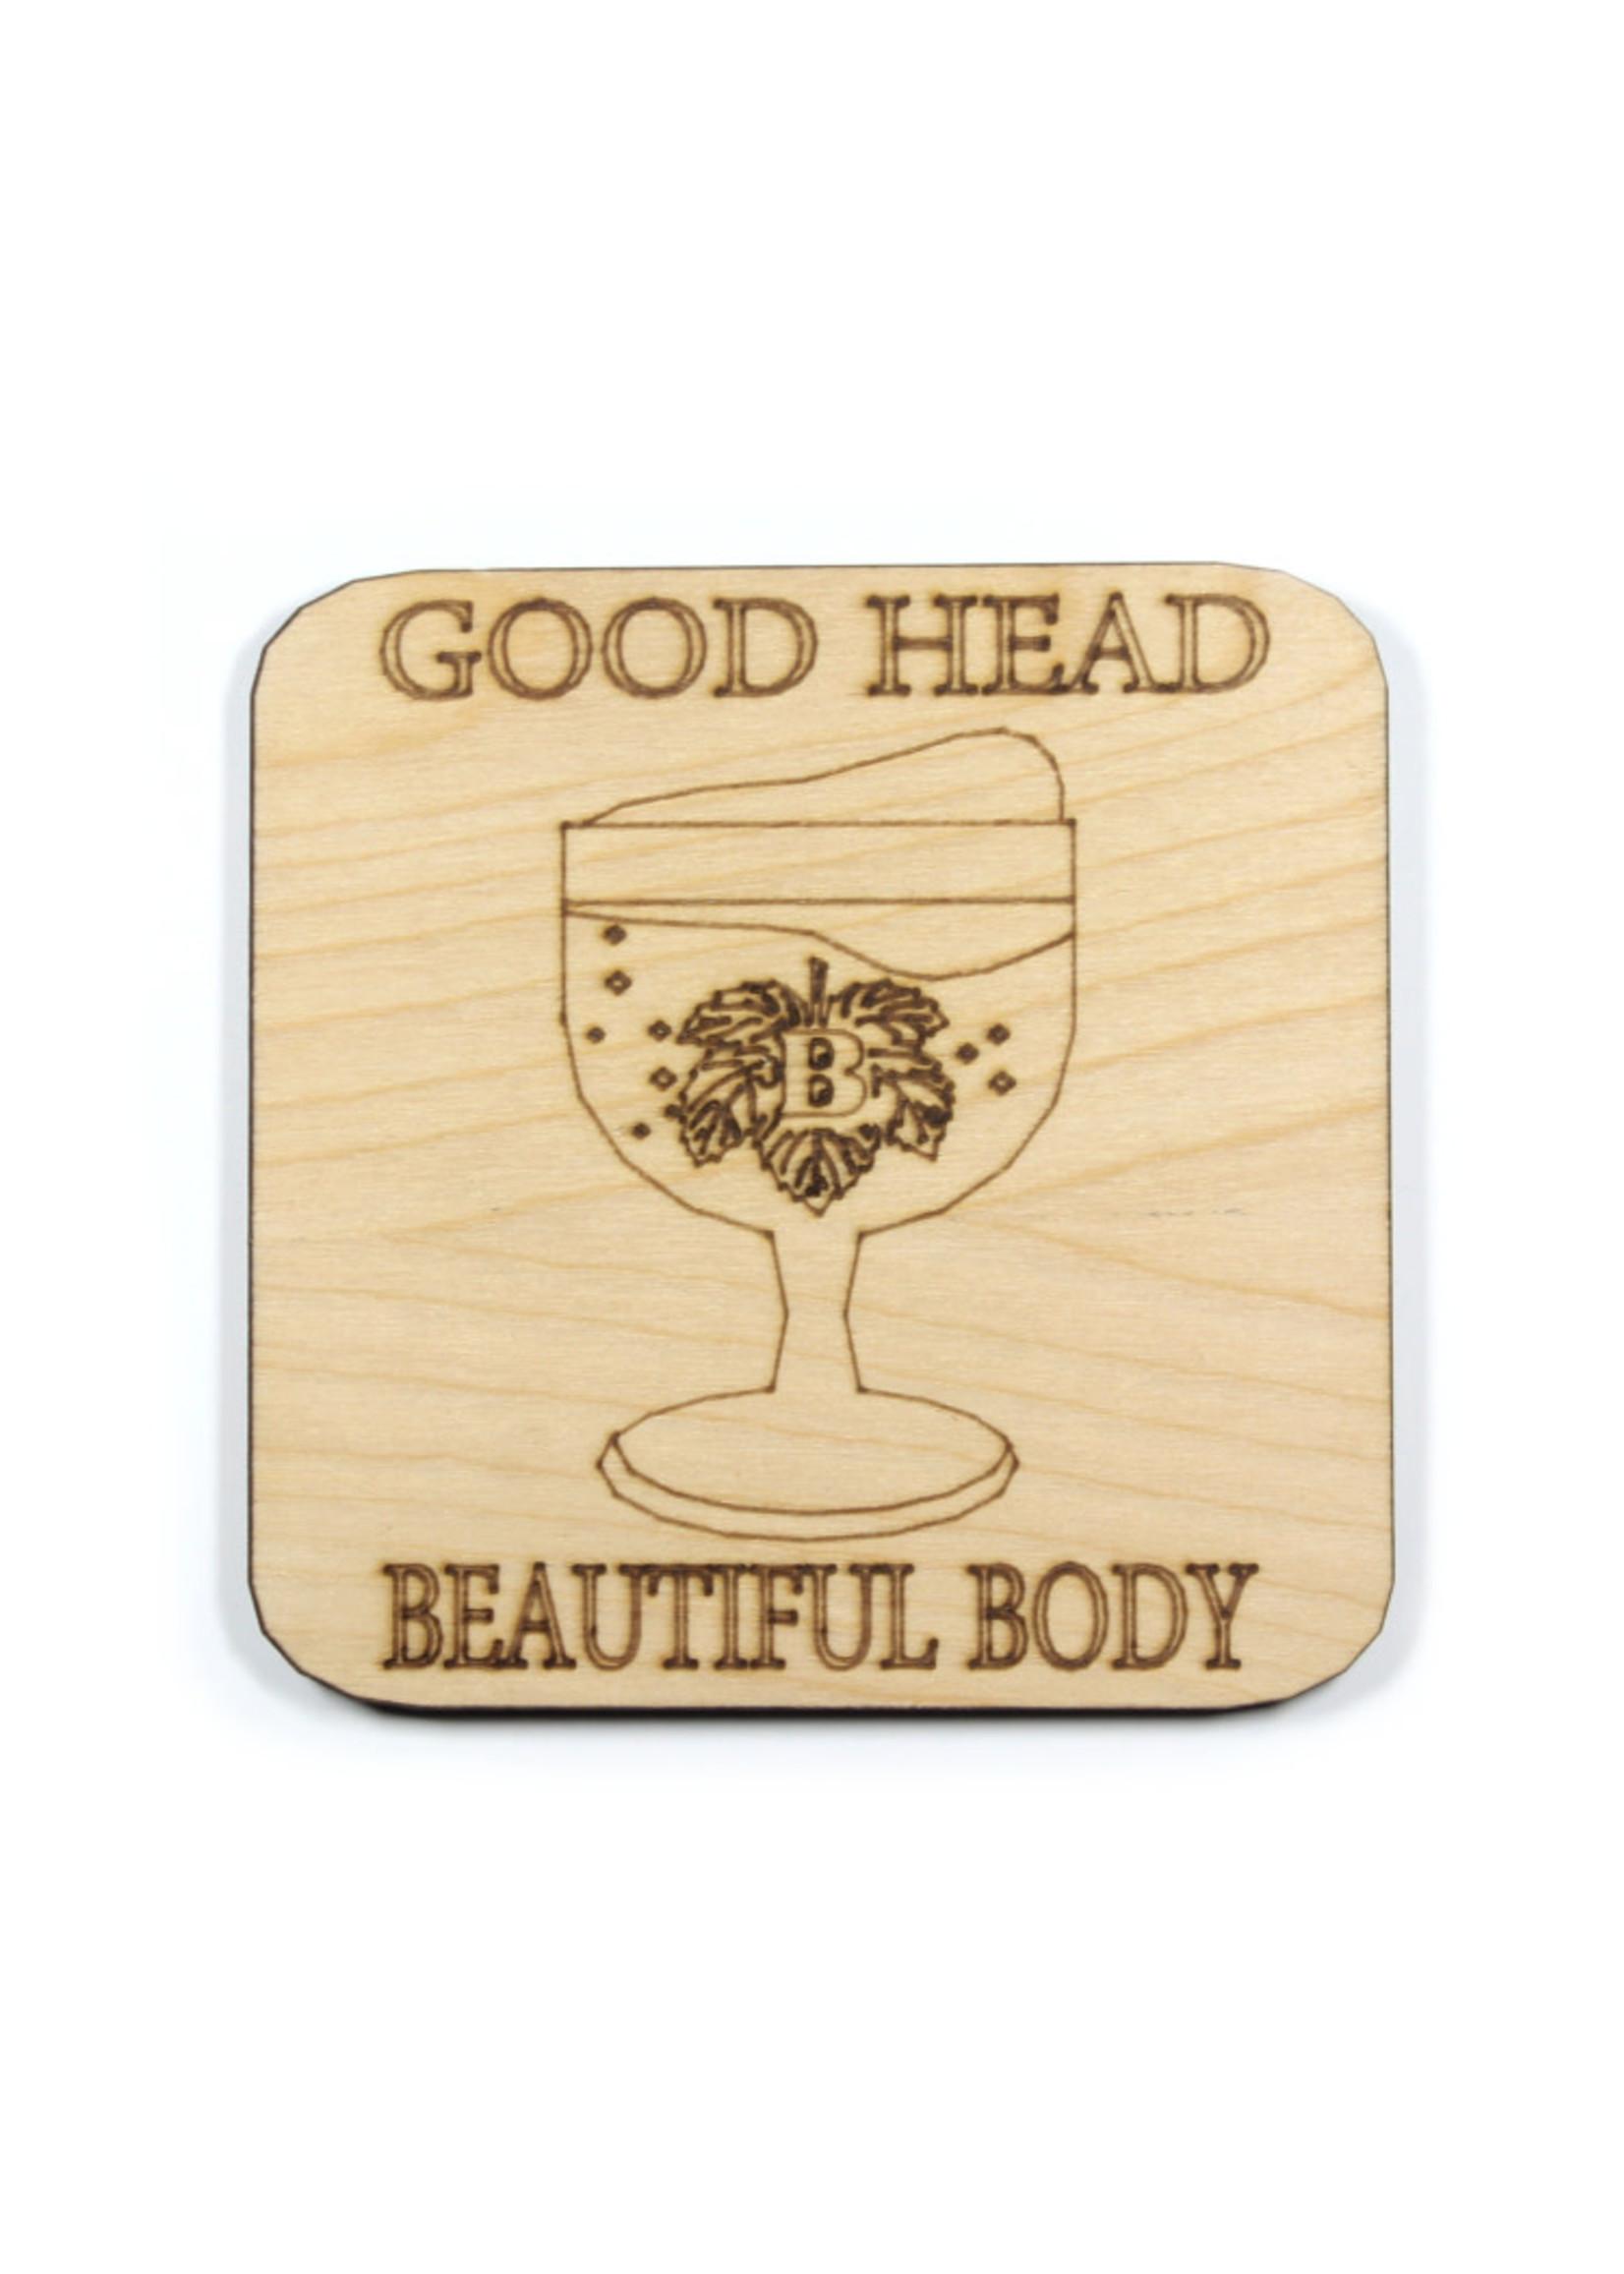 Pabst Wooden Coaster - Beer Good Head